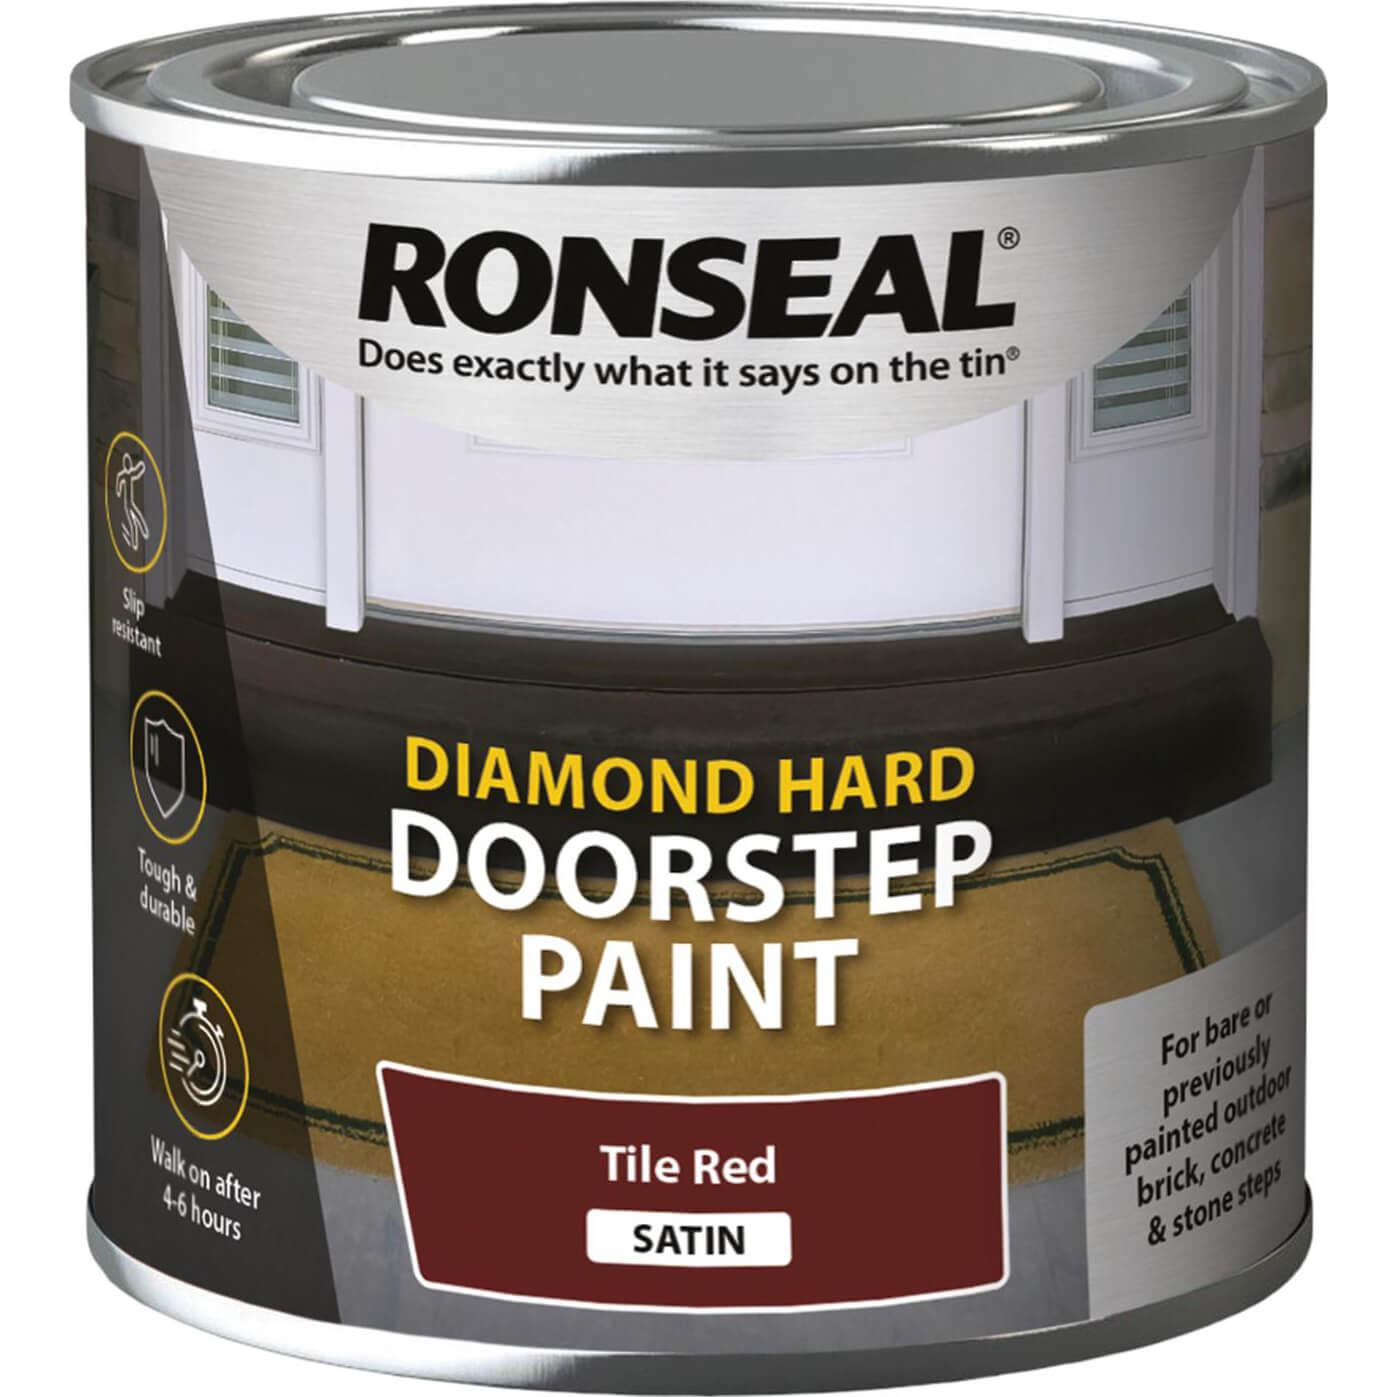 Image of Ronseal Diamond Hard Door Step Paint Tile Red 250ml